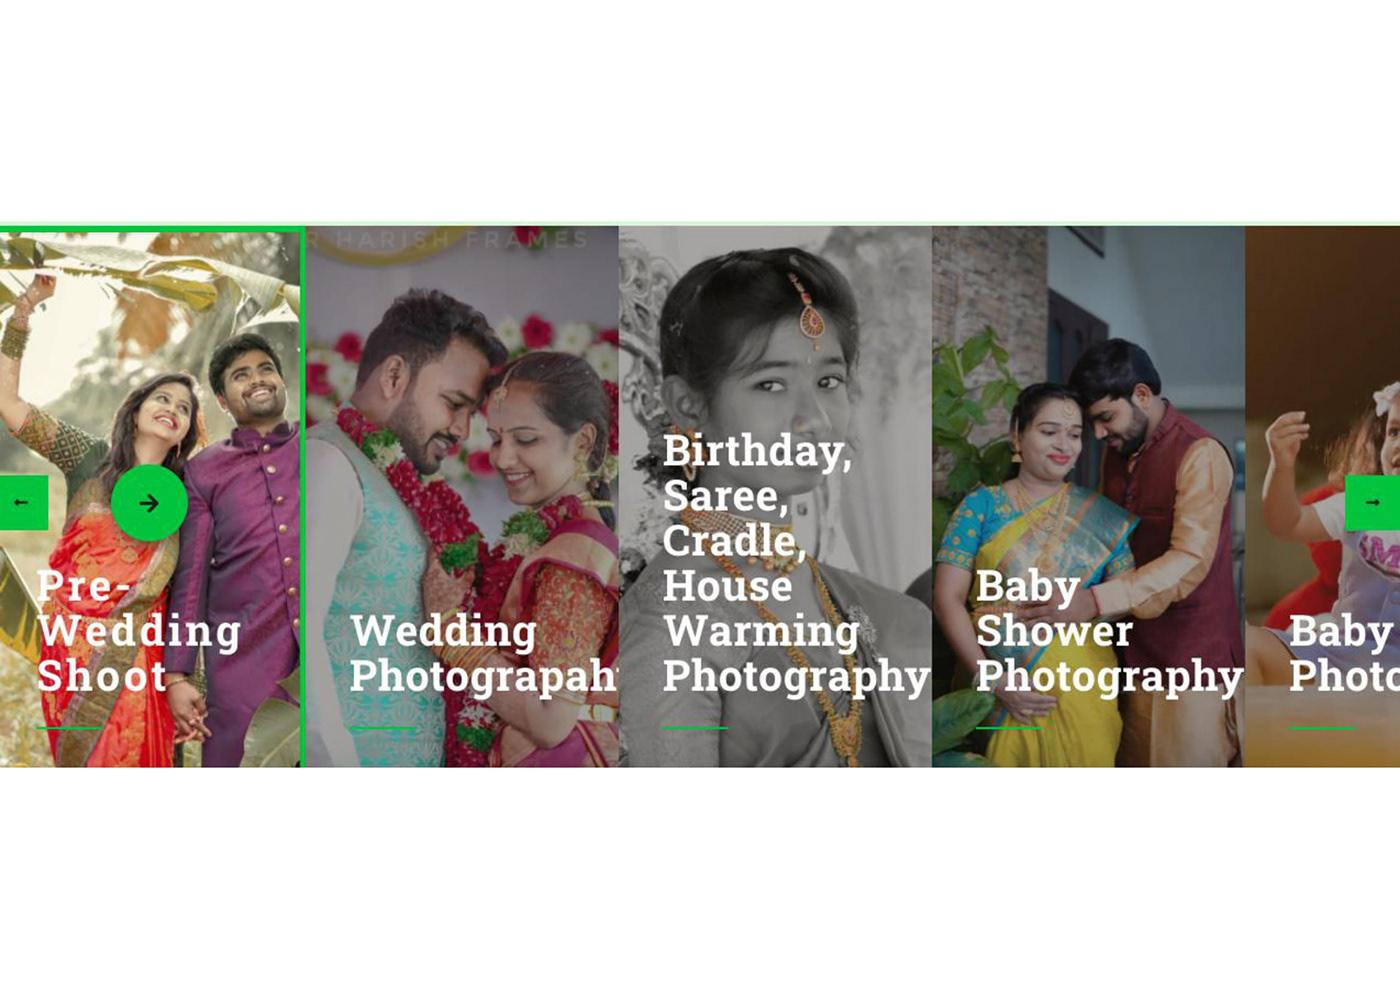 LR Harish Frames LR Harish Frames Website Photography Hyderabad photography website Wedding Photographer Wedding Photography Site wedding website